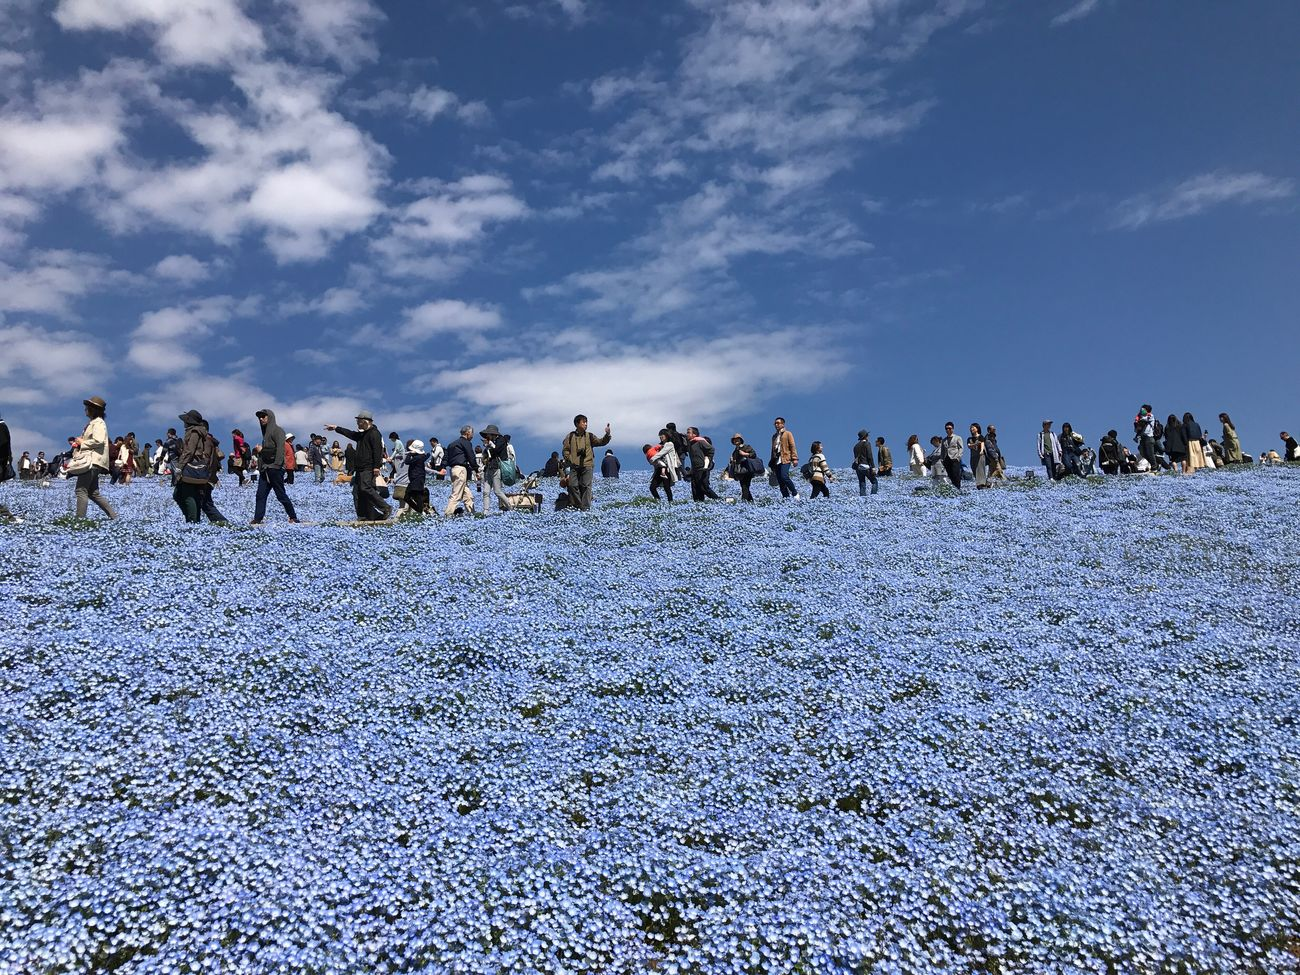 HitachiSeaSidePark Japan Large Group Of People Sky Cloud - Sky Men Real People Nature Crowd Day Outdoors Blue Women Beauty In Nature Lifestyles People